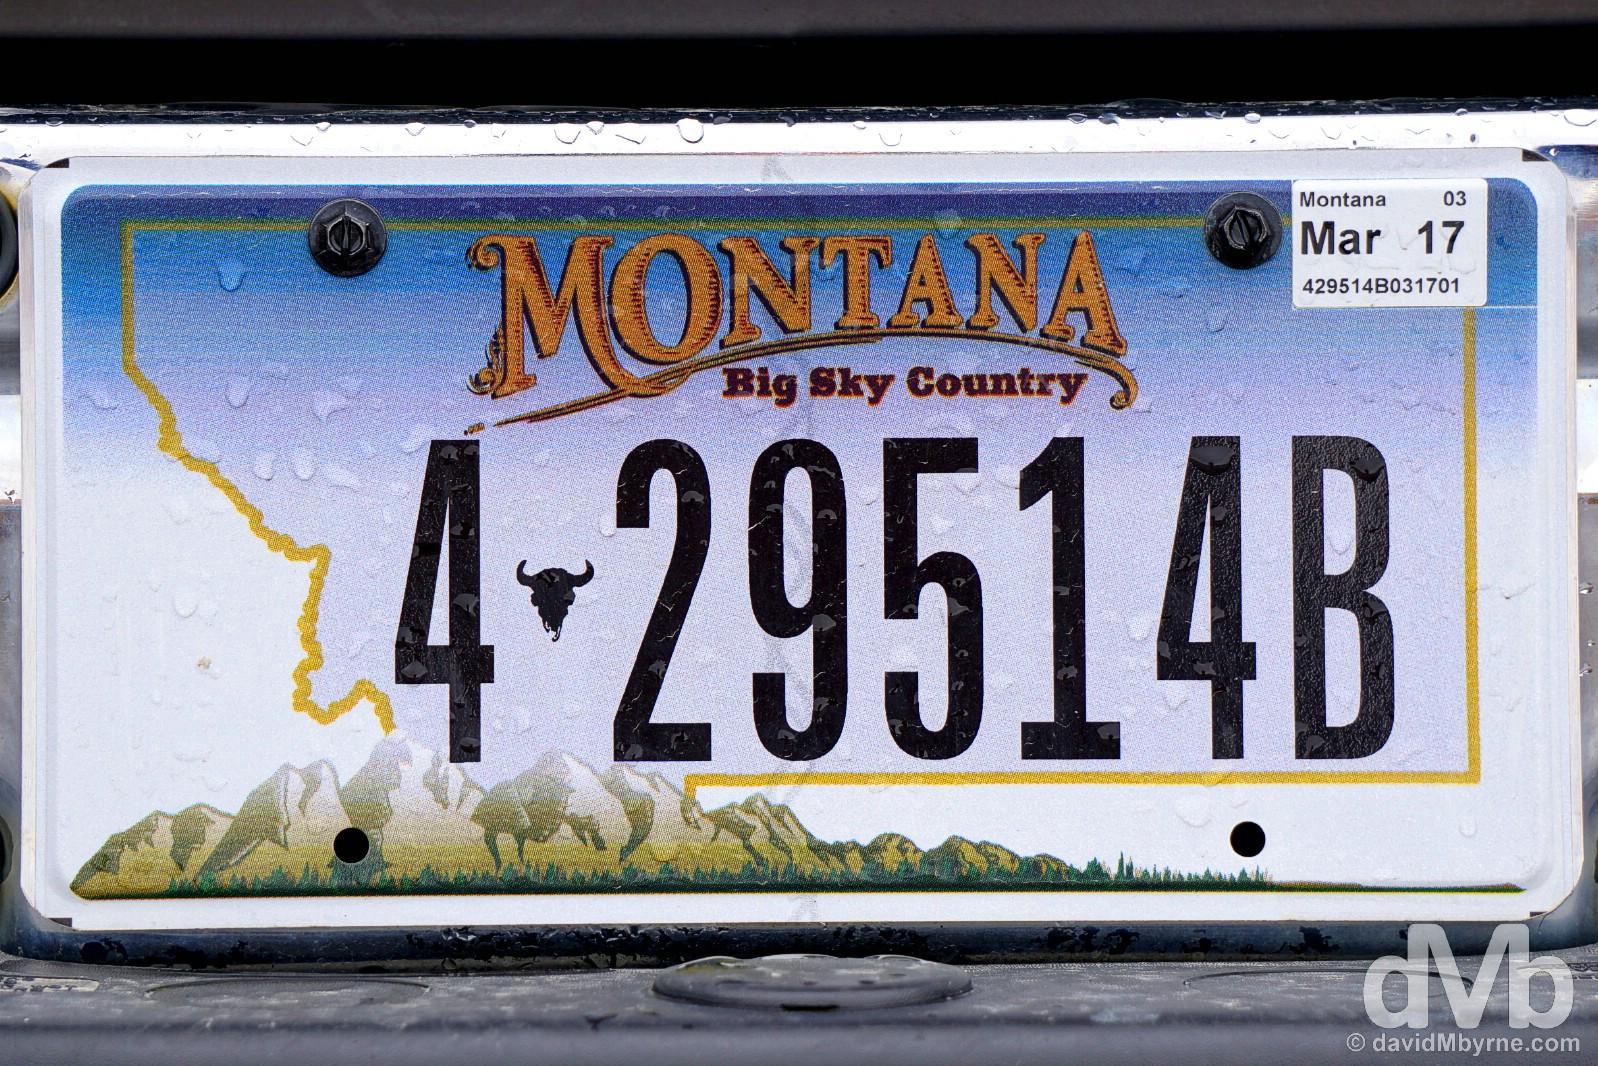 Montana plate, Beartooth Highway, Montana, USA. September 4, 2016.